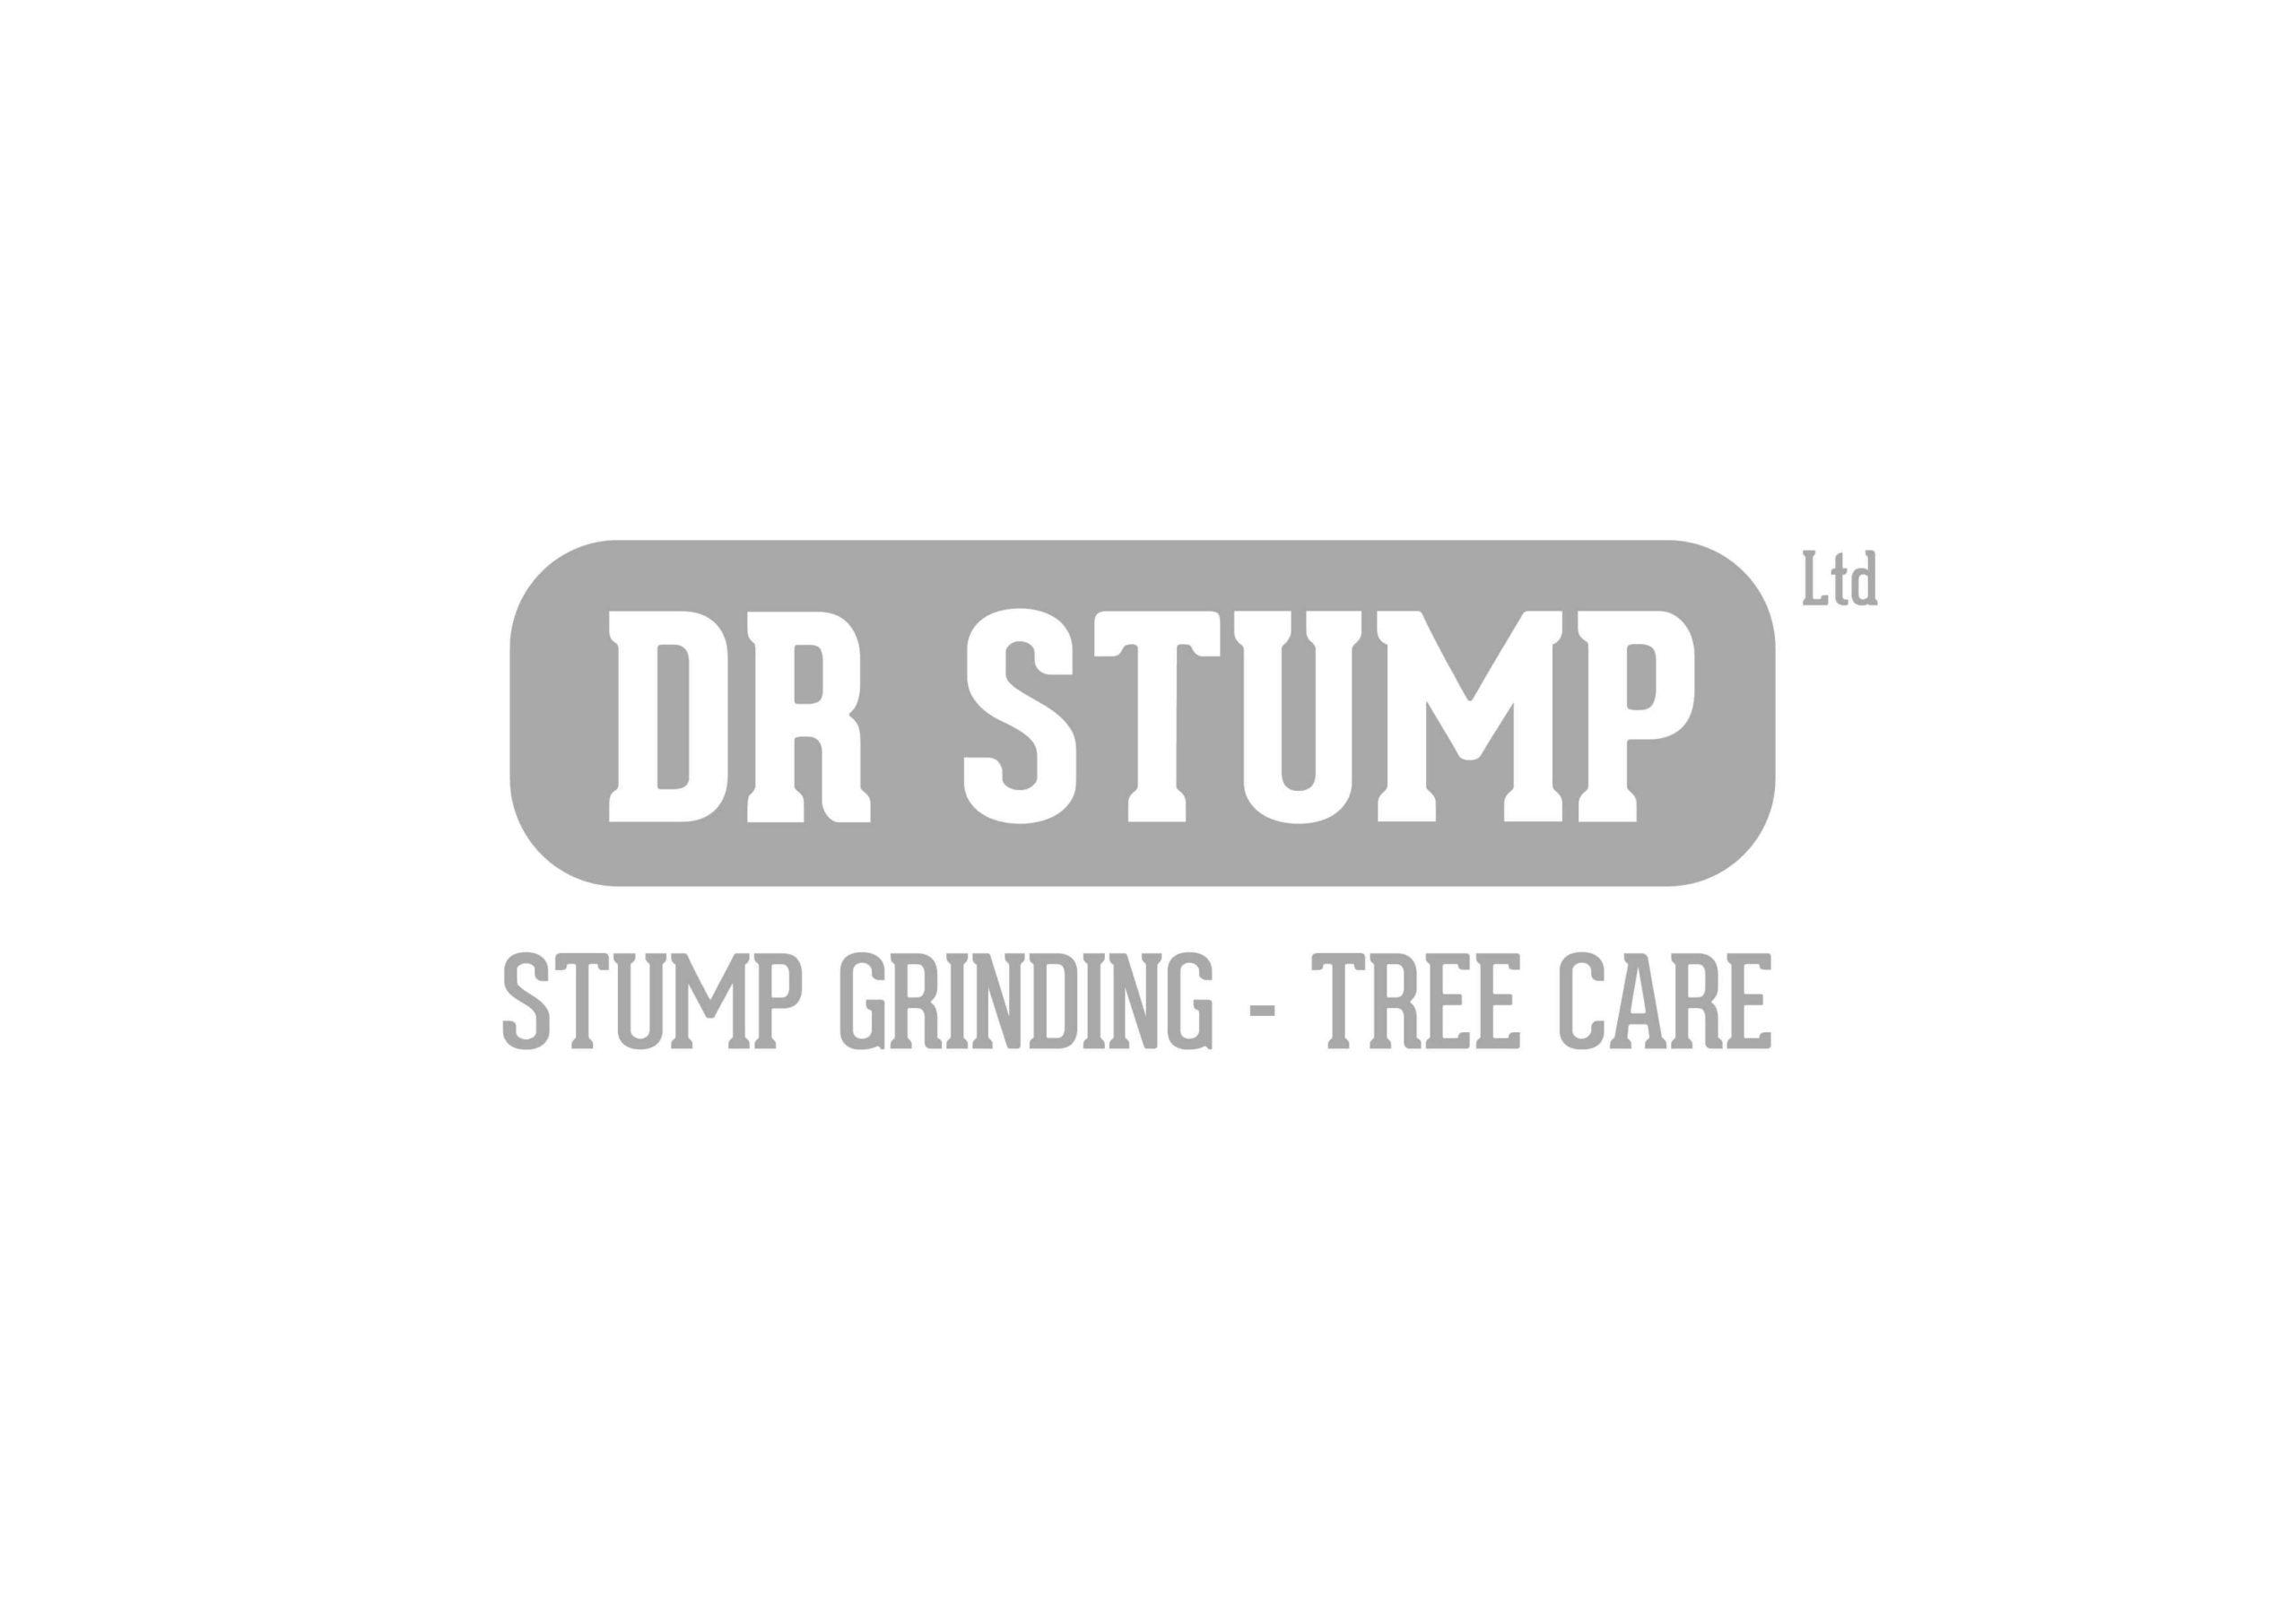 dr stump logo